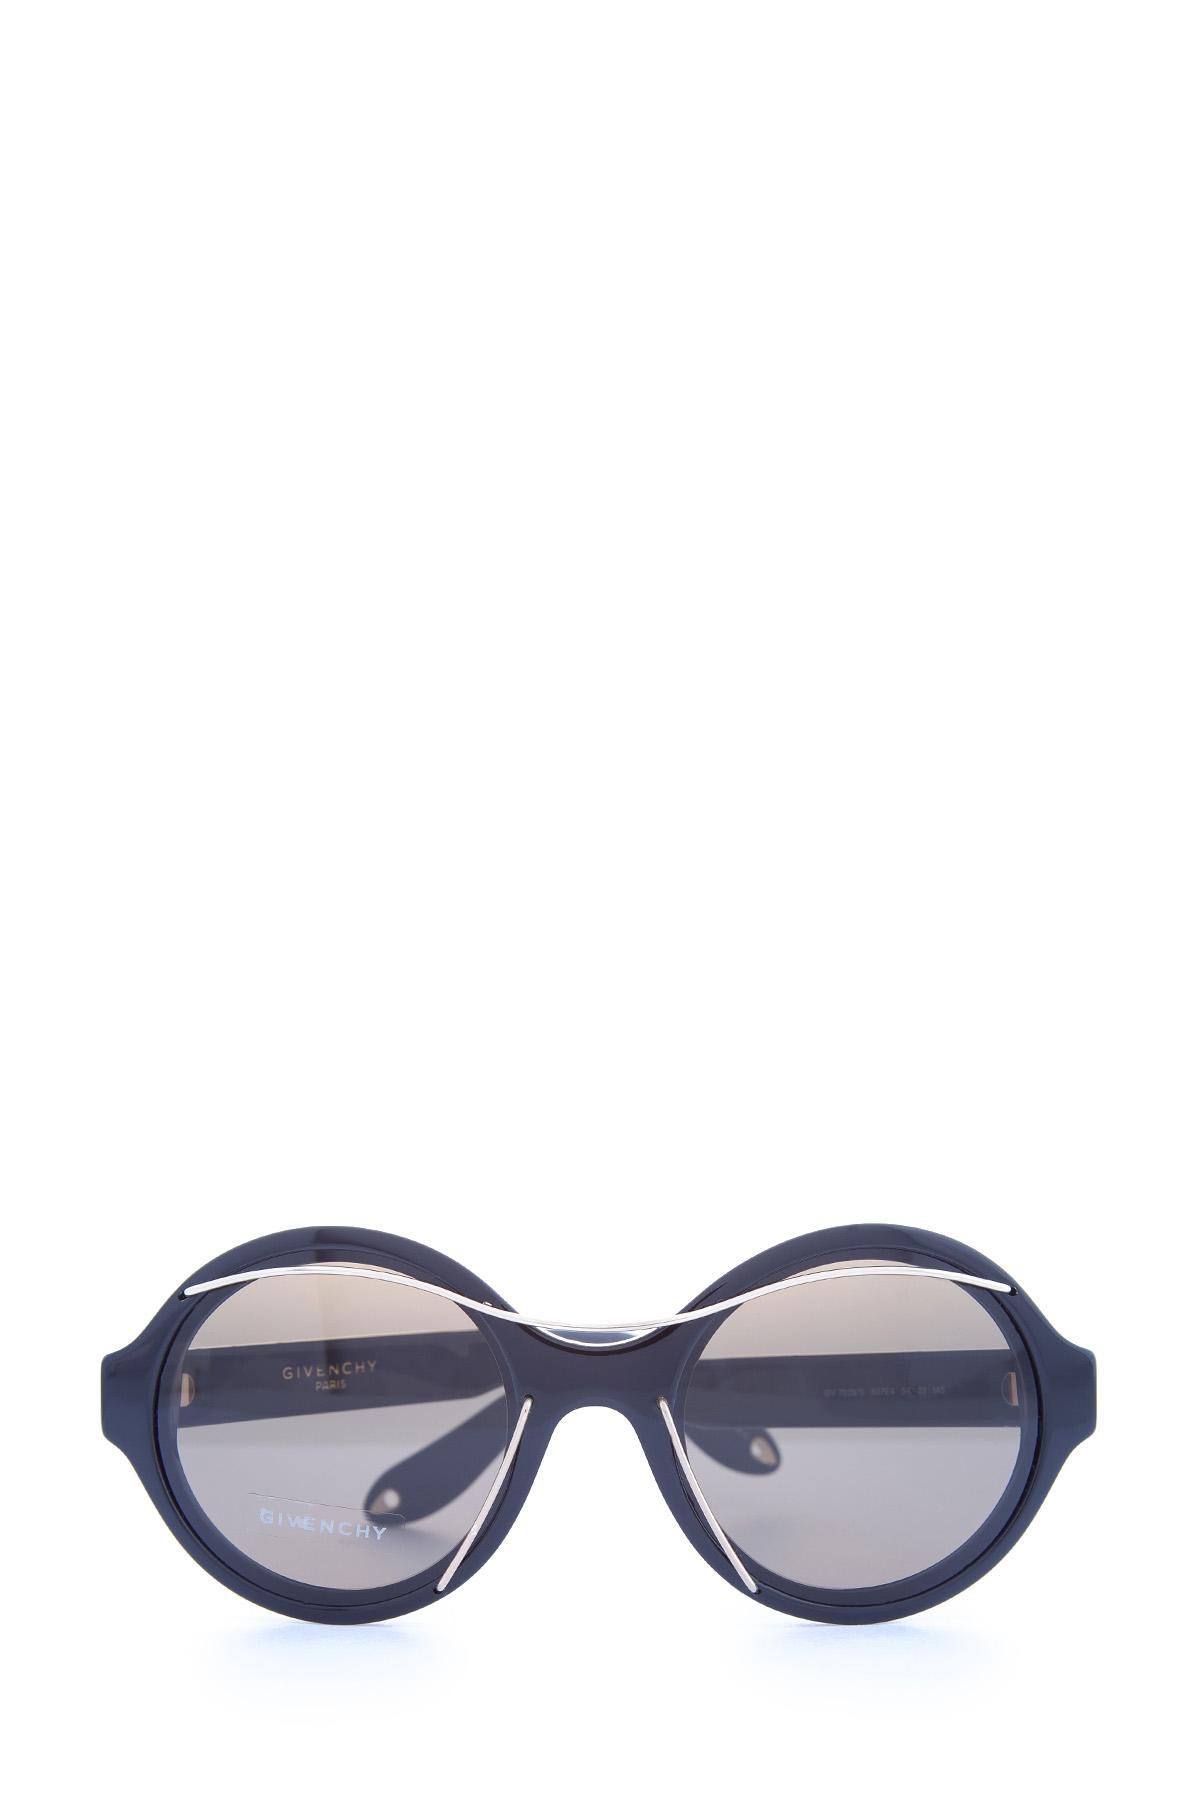 Купить Очки, GIVENCHY (sunglasses), Франция, пластик 100%, стекло 100%, металл 100%